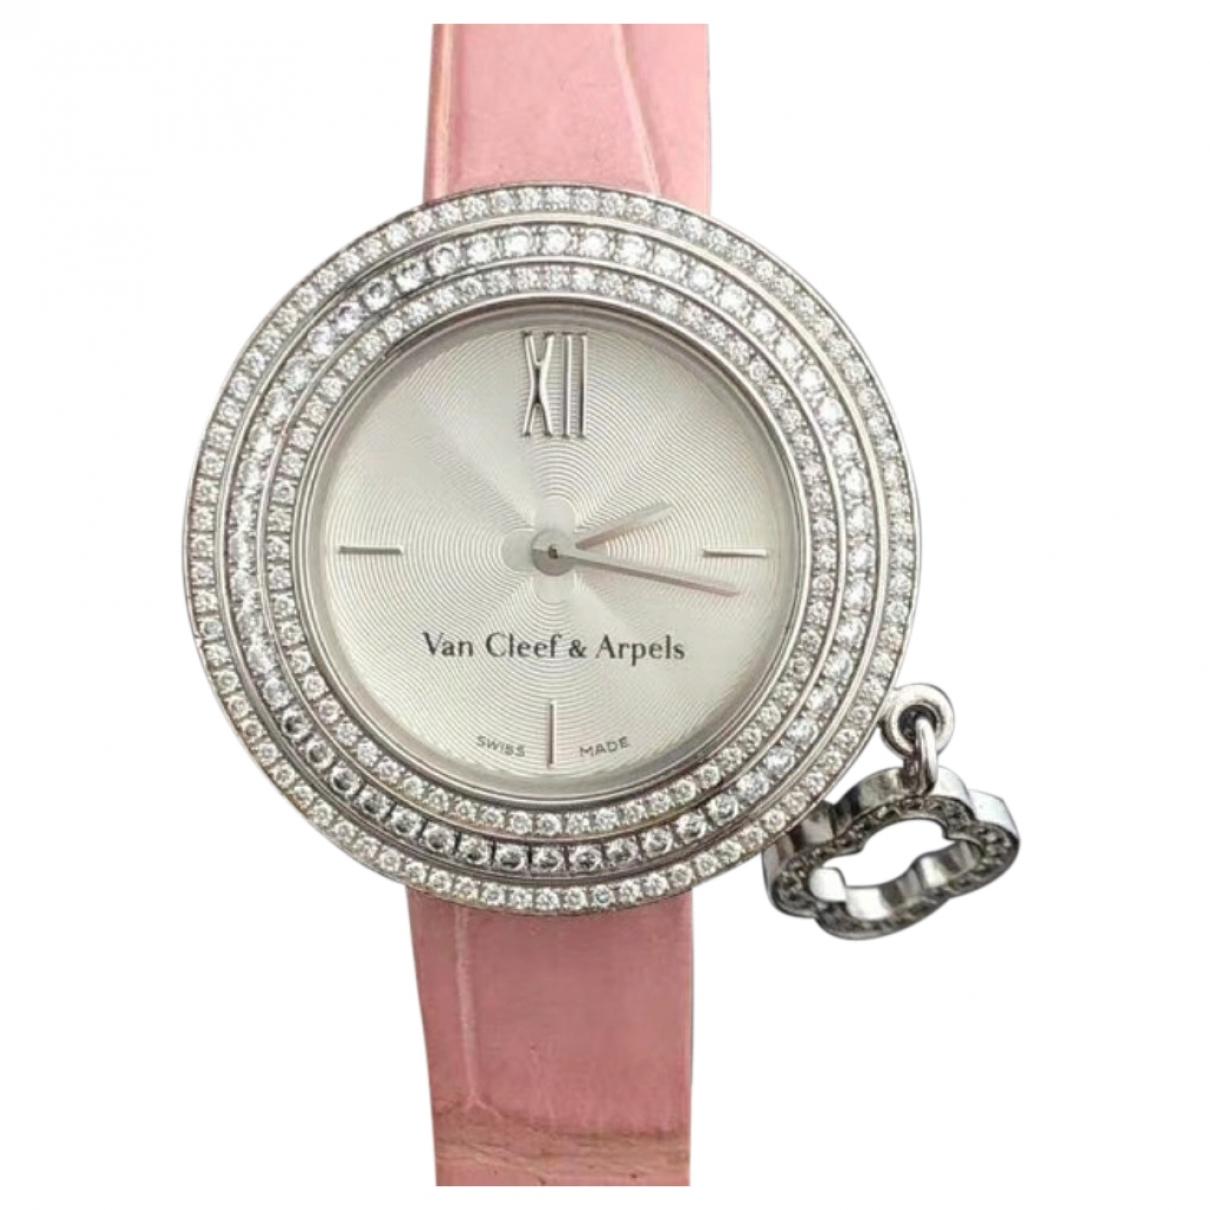 Reloj Charms de Oro blanco Van Cleef & Arpels